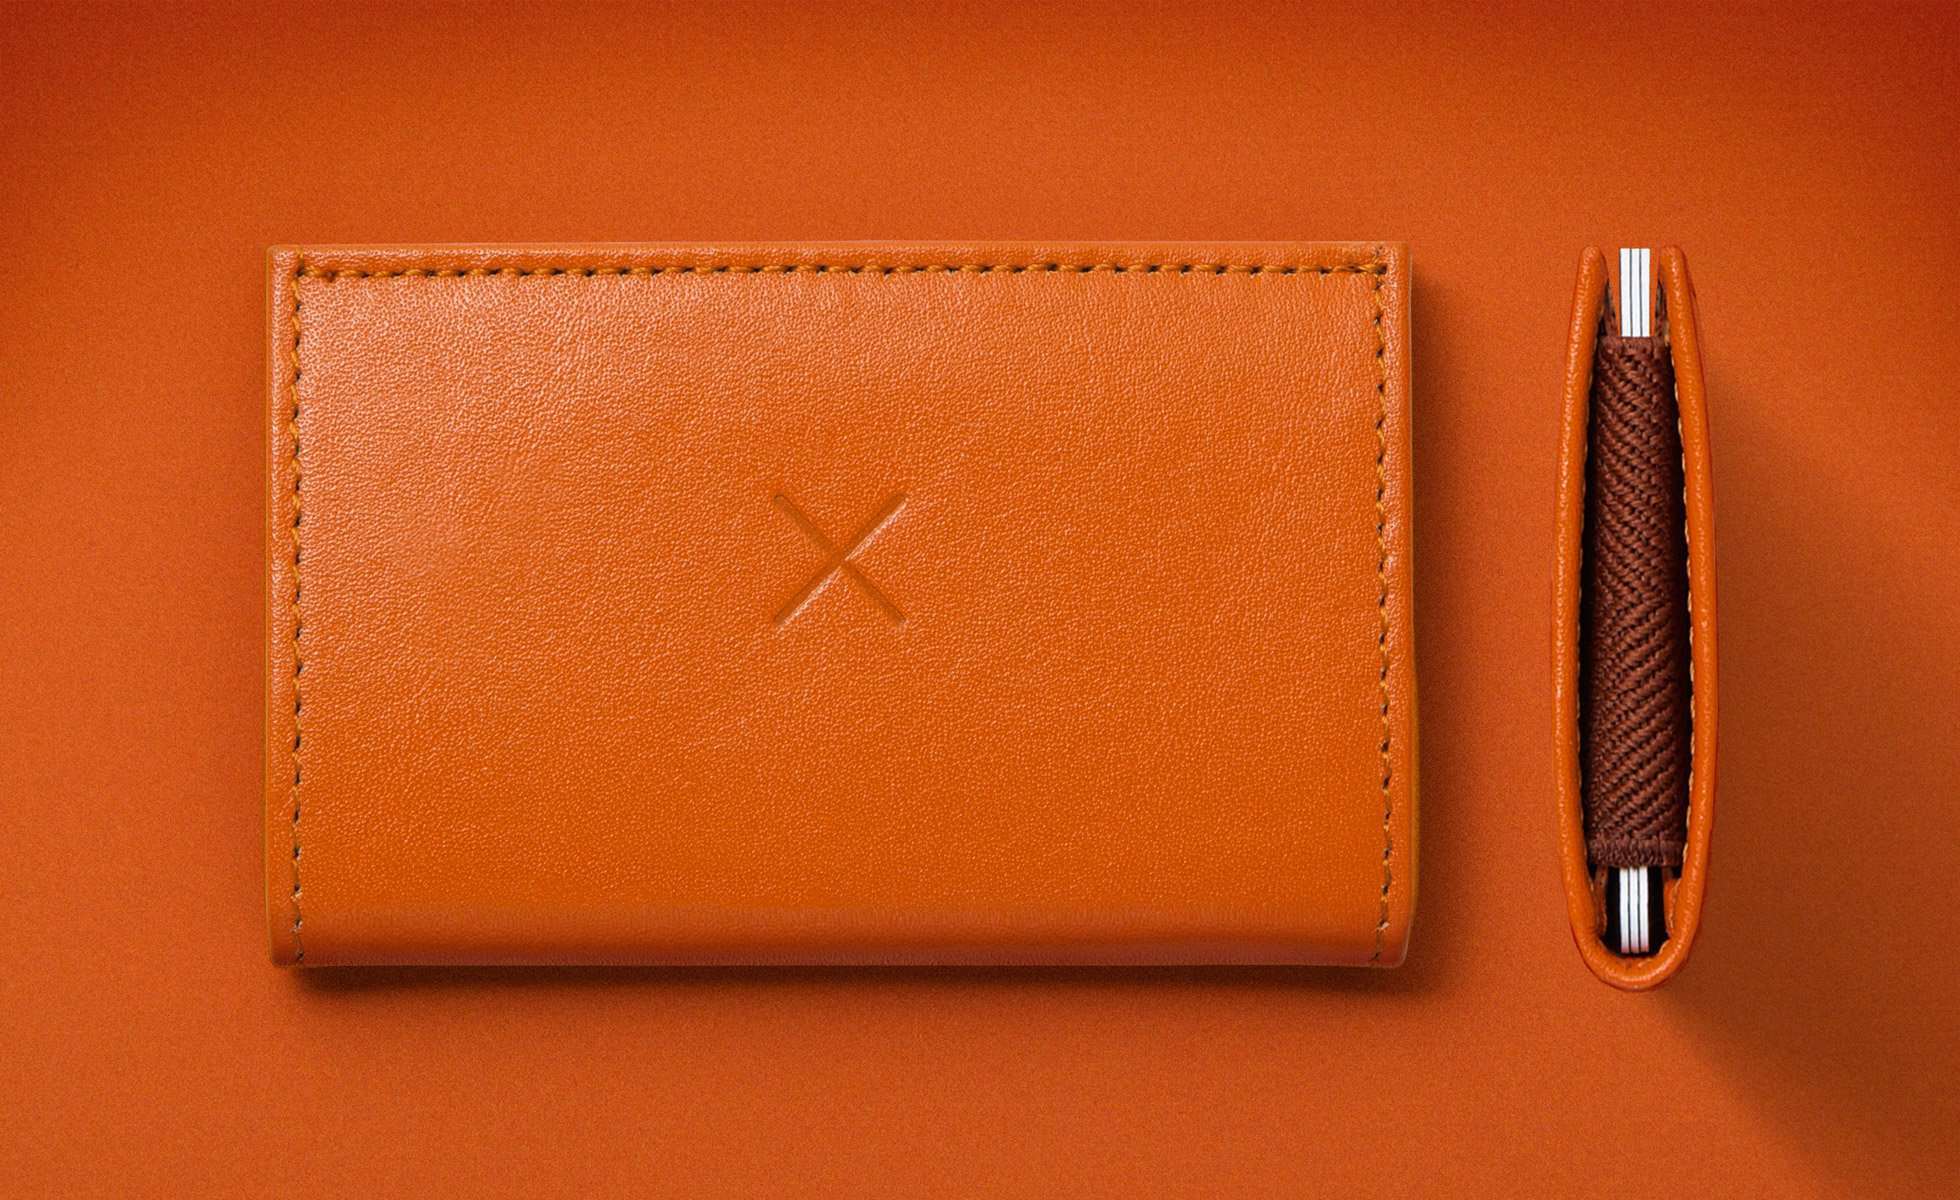 Supr. Slim 2 Wallet